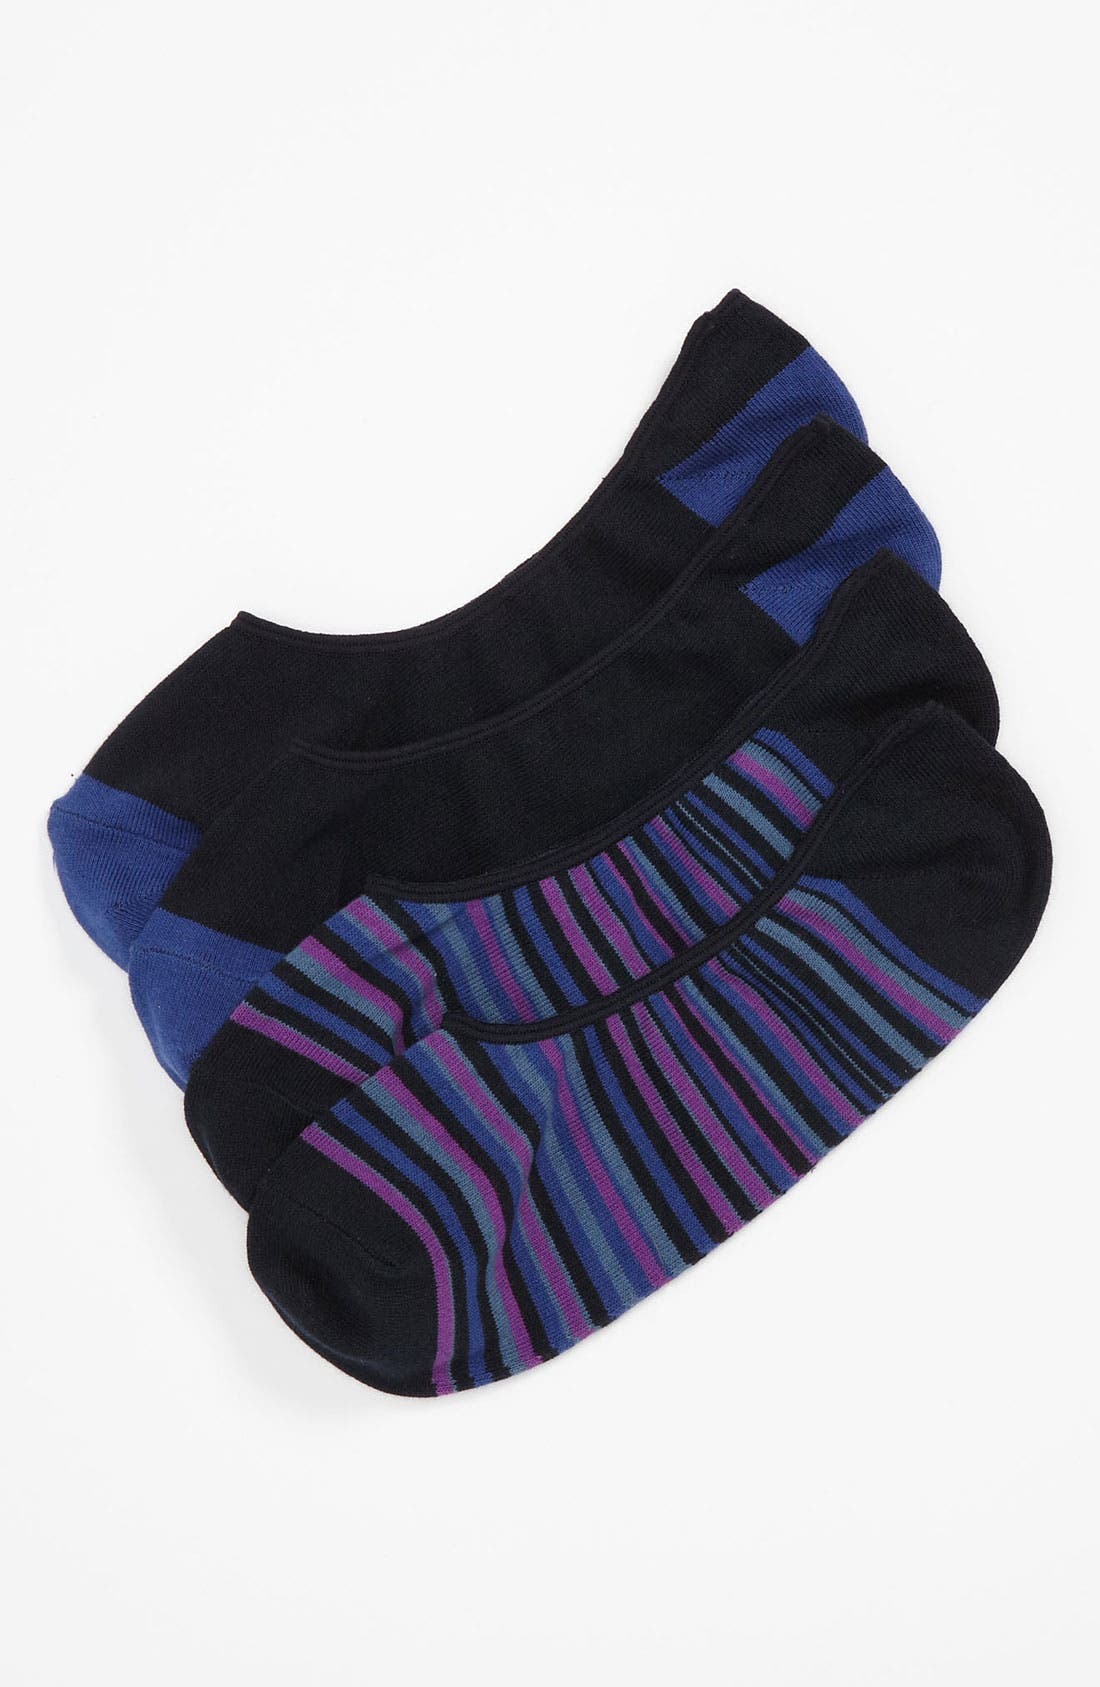 Main Image - Cole Haan 'Town Stripe' Liner Socks